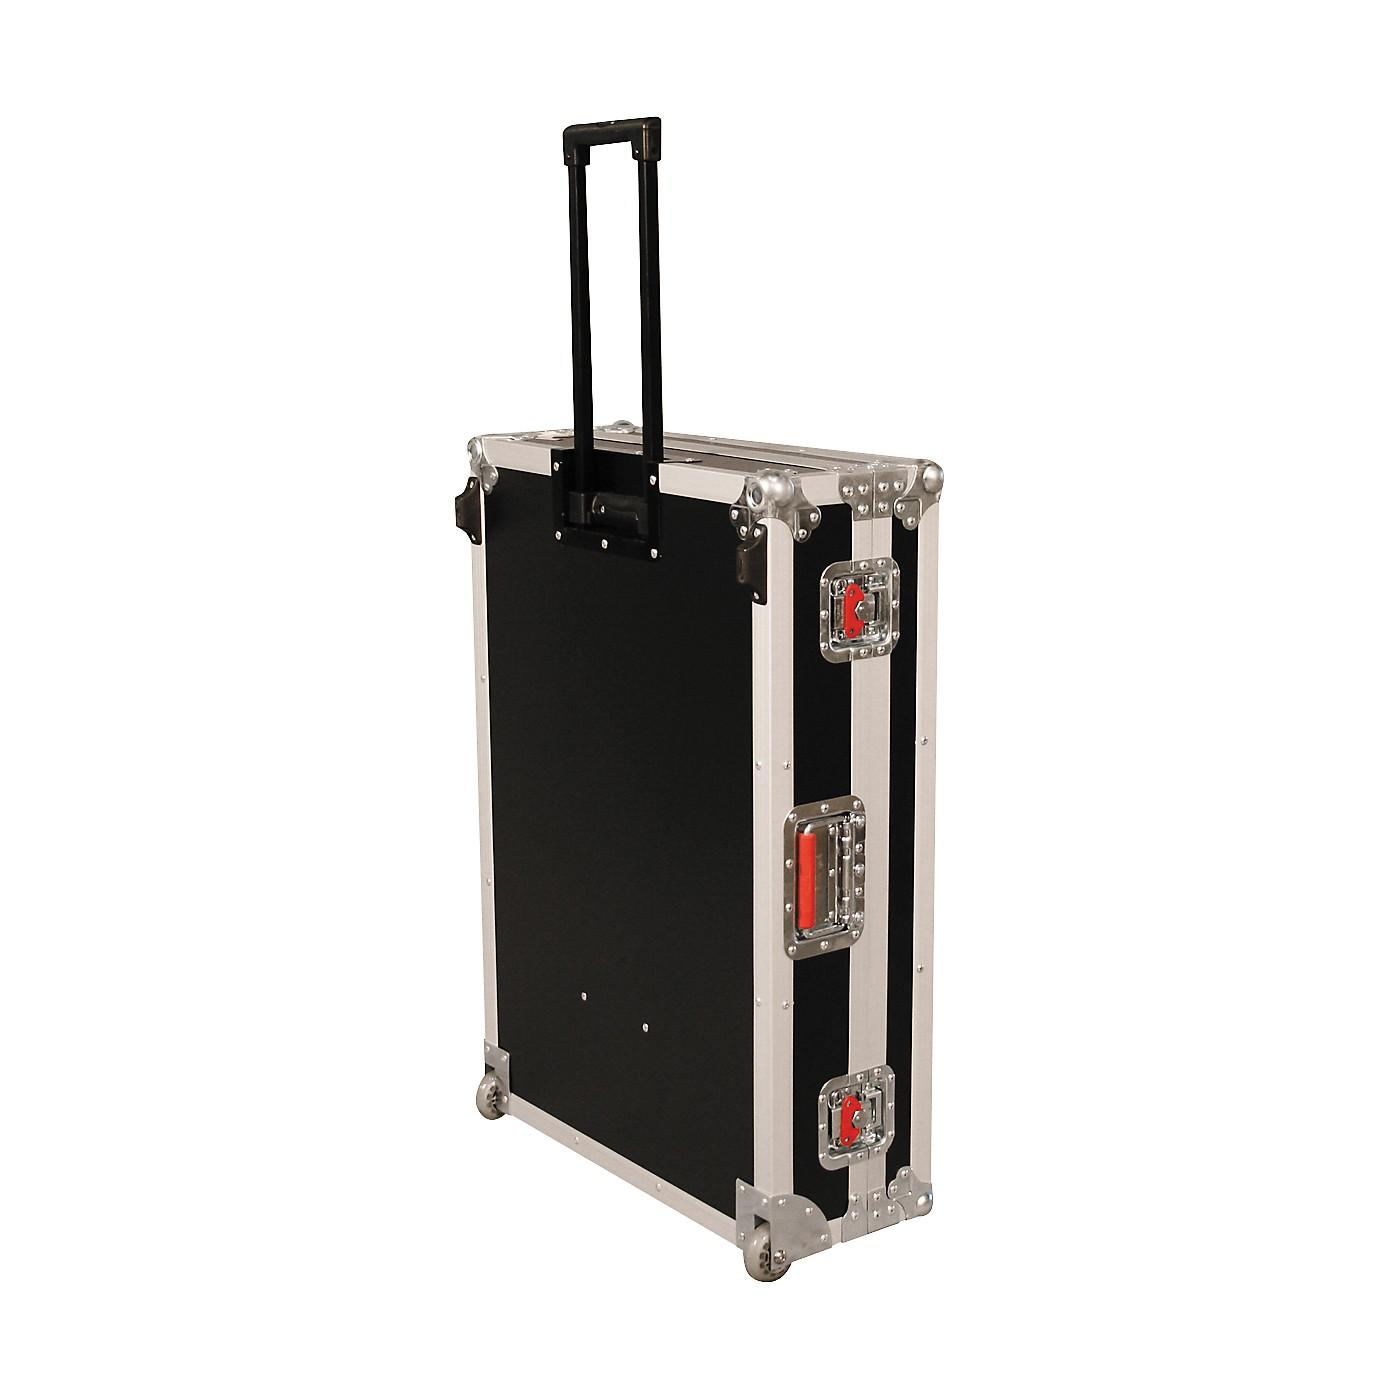 Gator G-Tour 20x30 Rolling ATA Mixer Road Case thumbnail